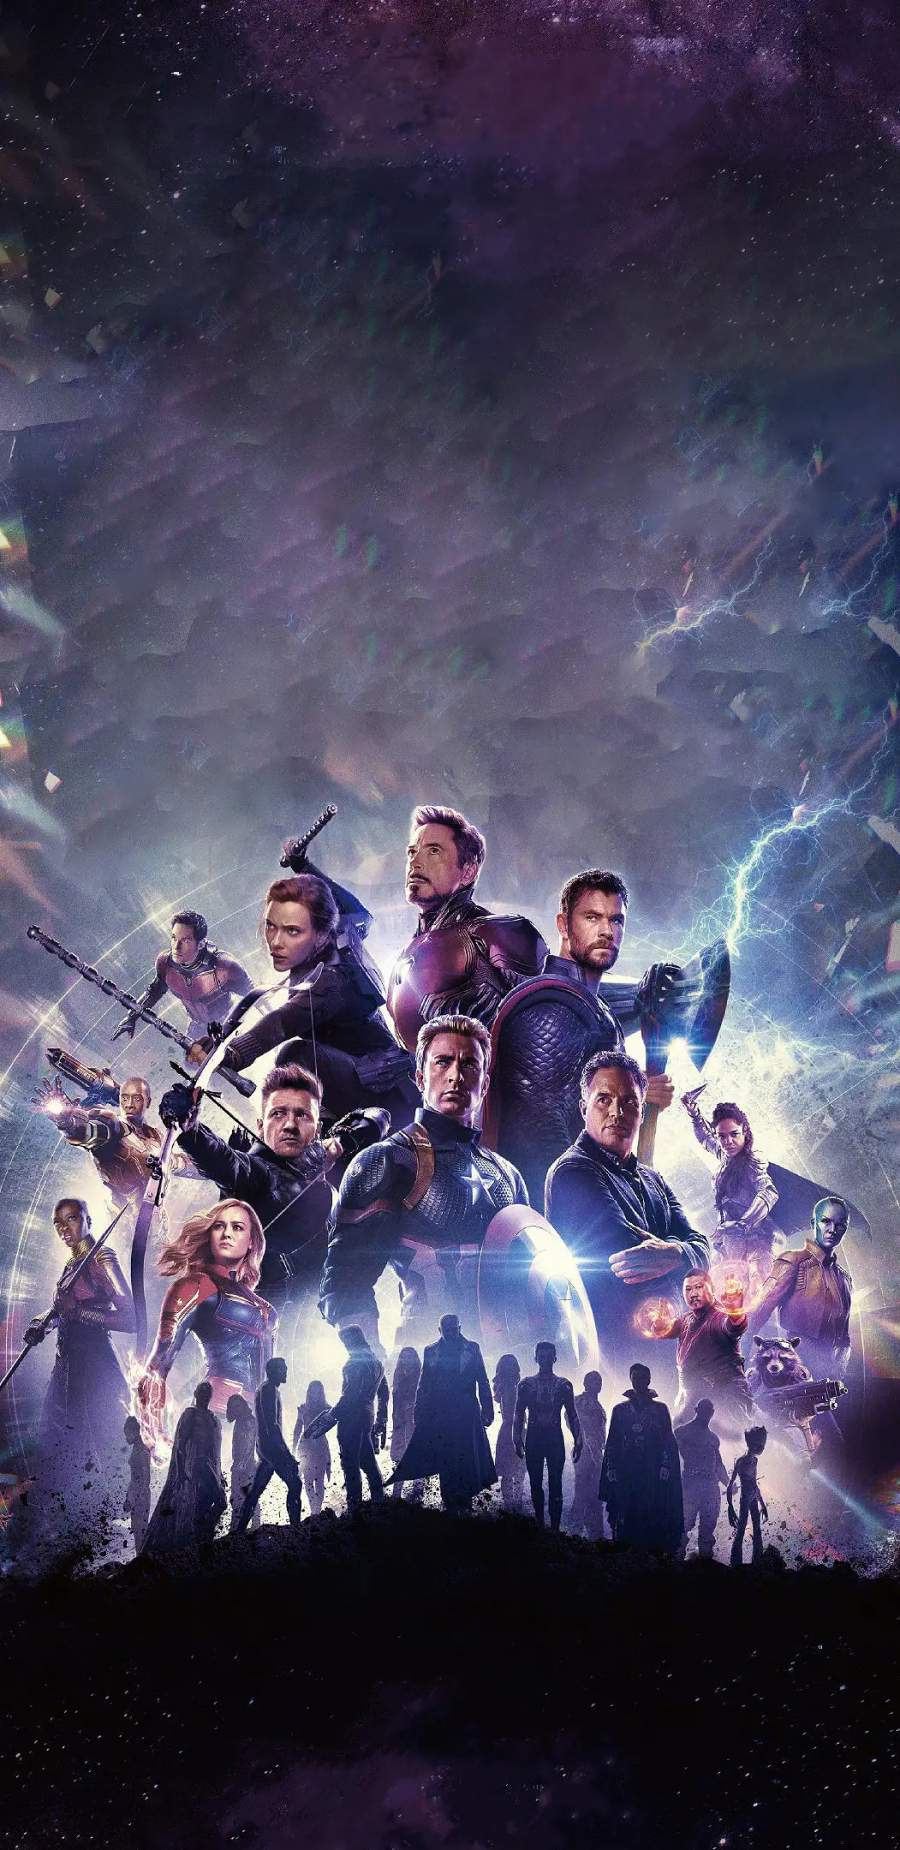 Avengers Poster iPhone Wallpaper